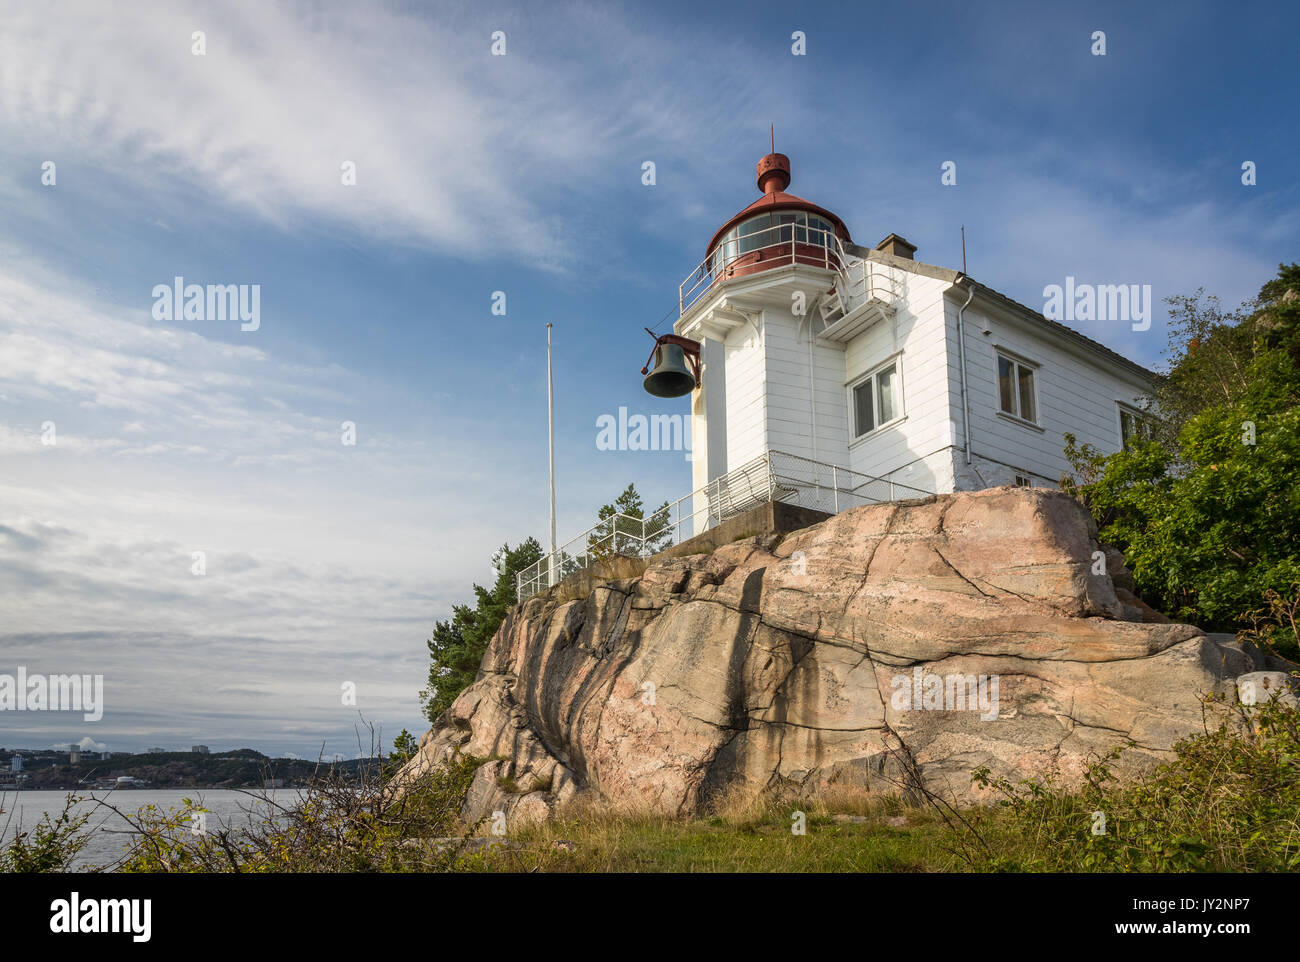 Lighthouse at Odderoya in Kristiansand, Norway - Stock Image